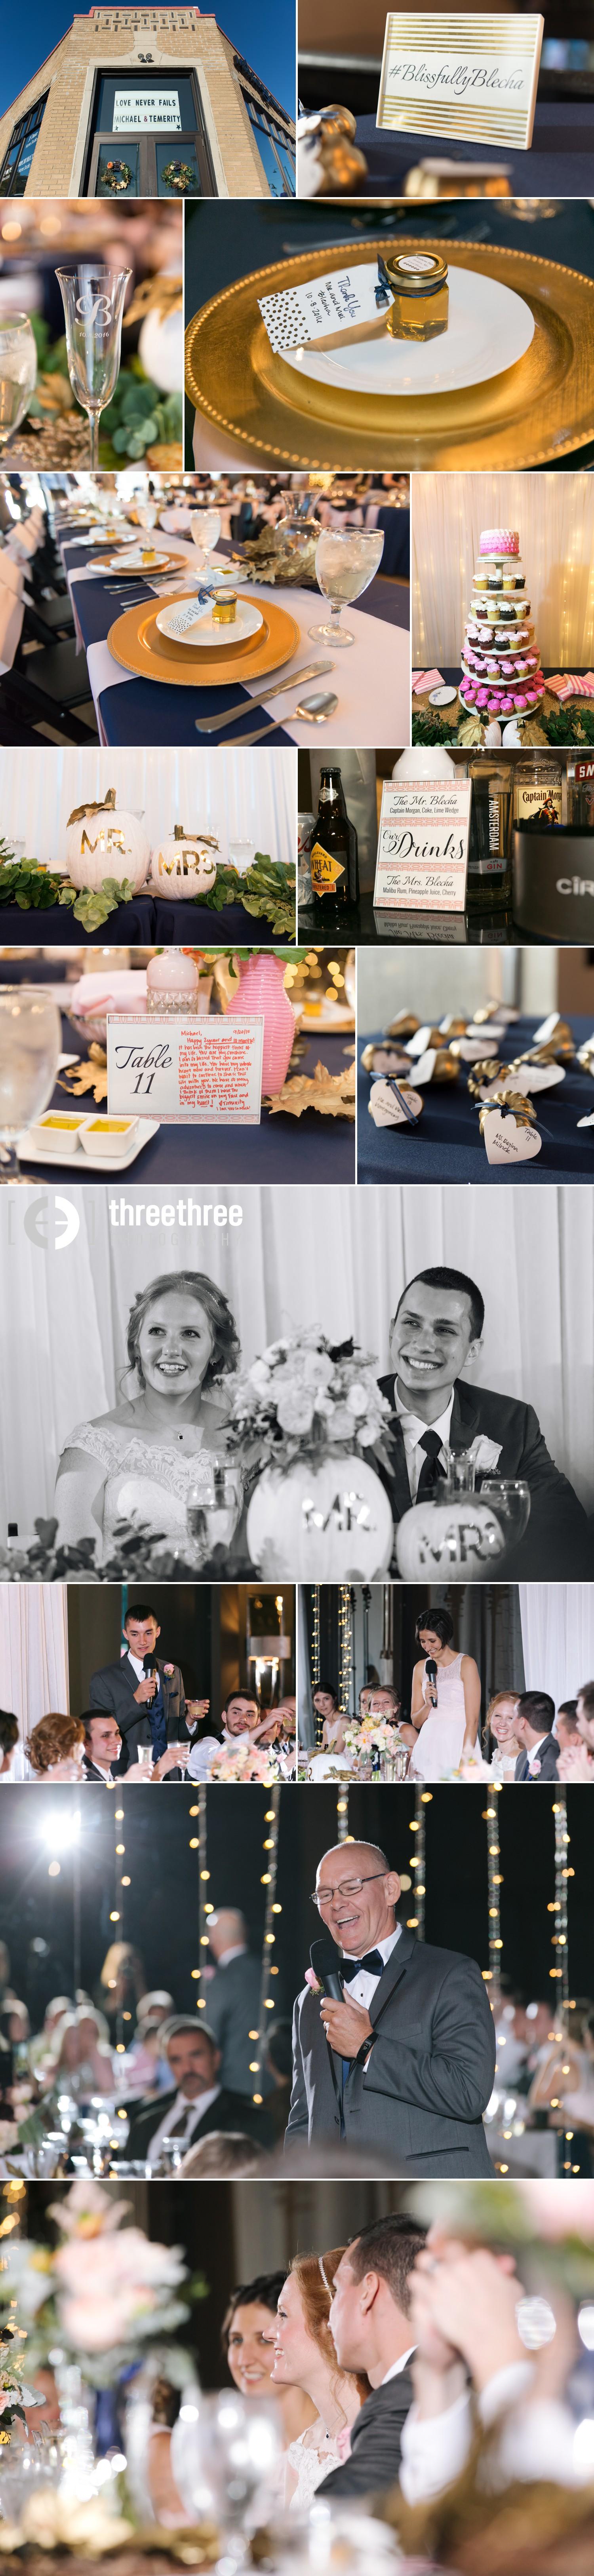 Temerity_KC Wedding Photography 7.jpg